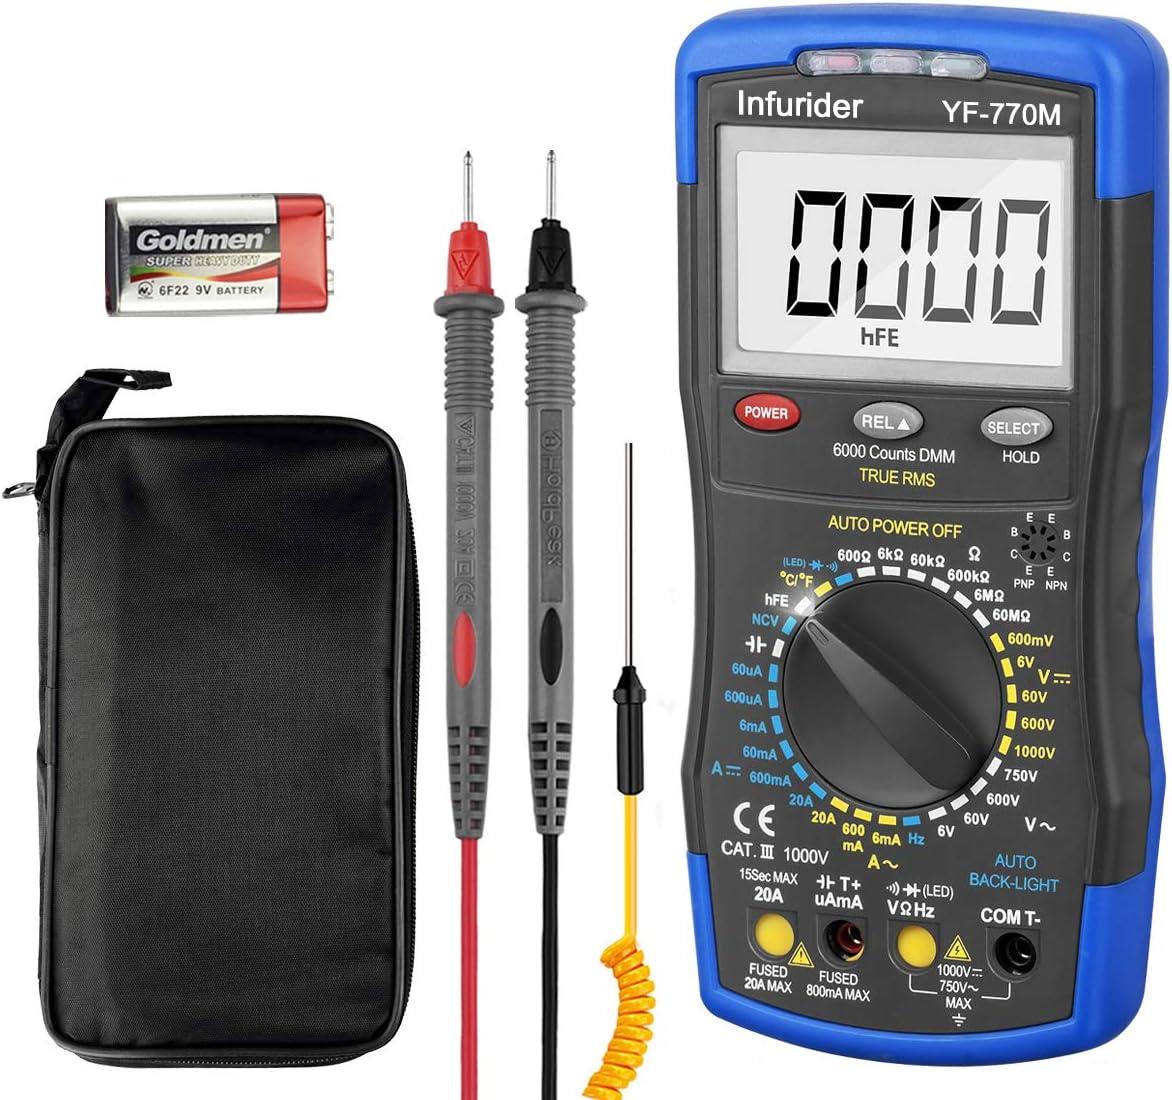 Digital Multimeter Infurider YF-770M 6000 and Sales Manual 70% OFF Outlet Counts Manu